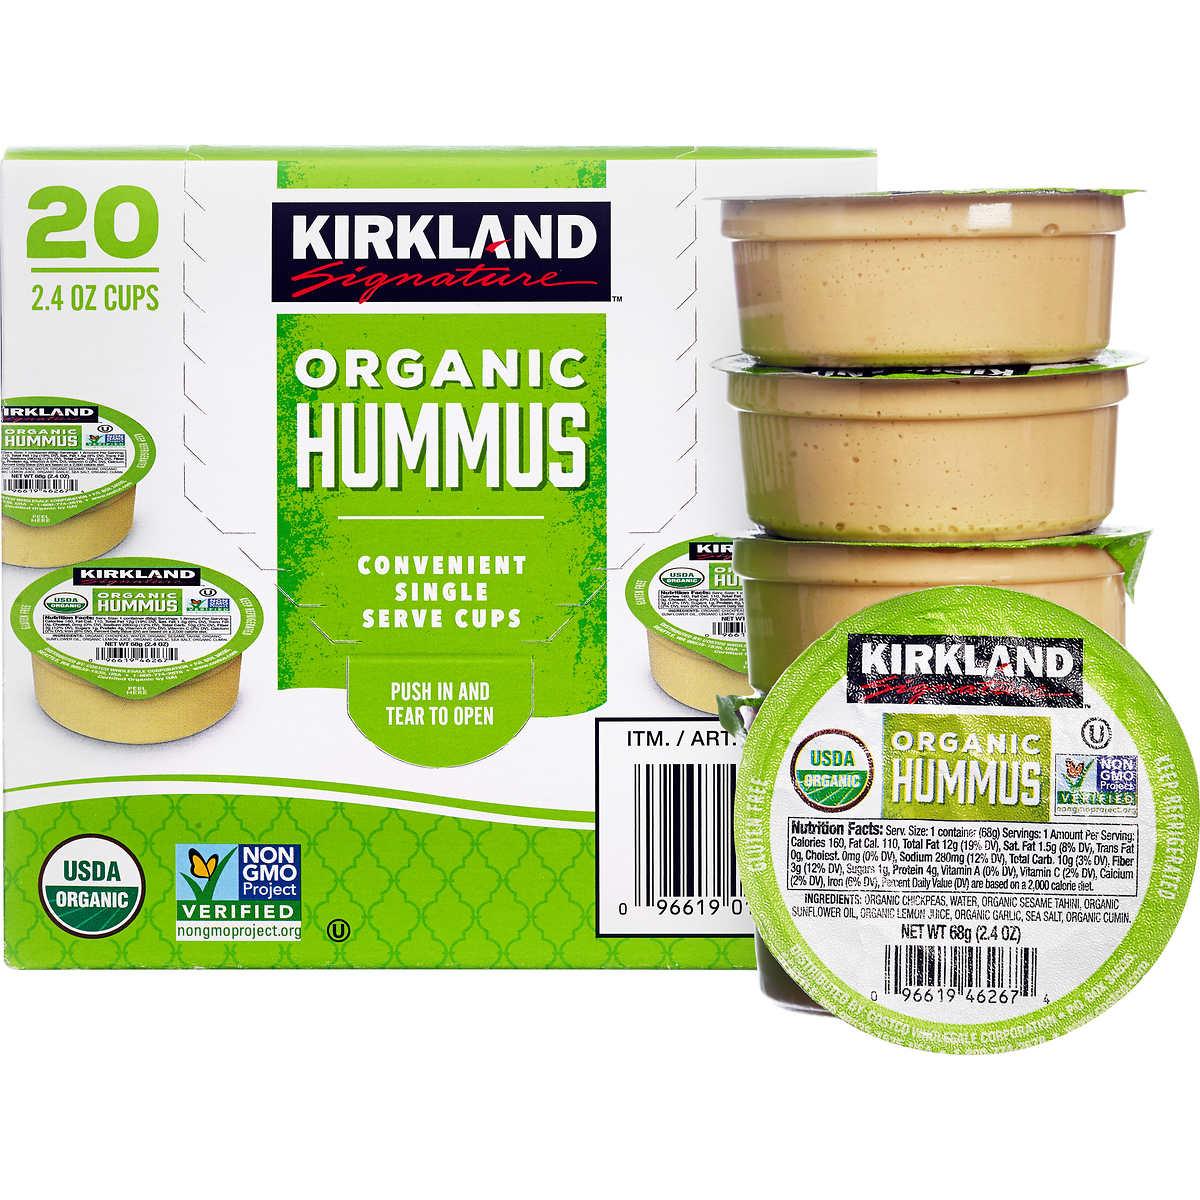 Hummus minis